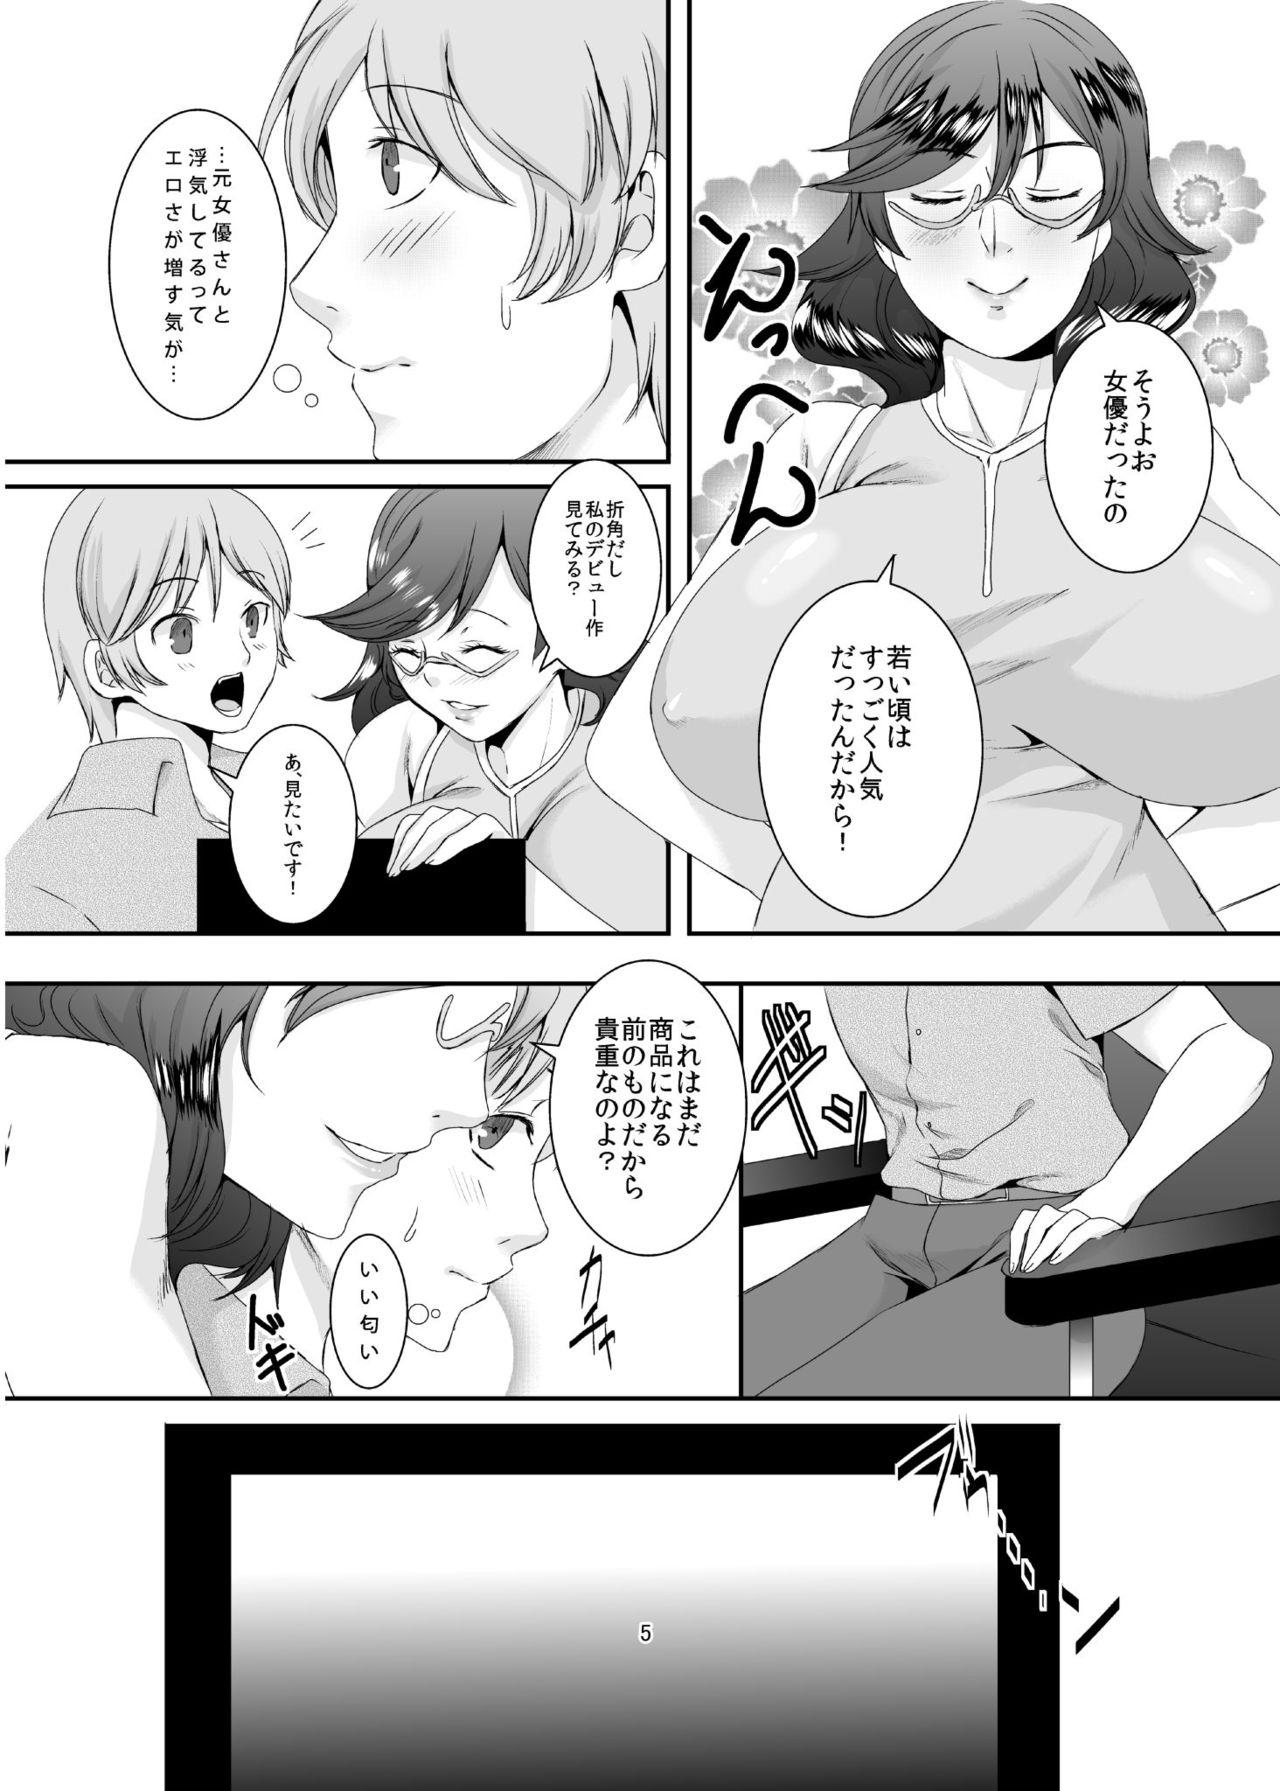 [Sprechchor (Eguchi Chibi)] Oku-sama wa Moto Yariman -Besluted- 5 [Digital] 5